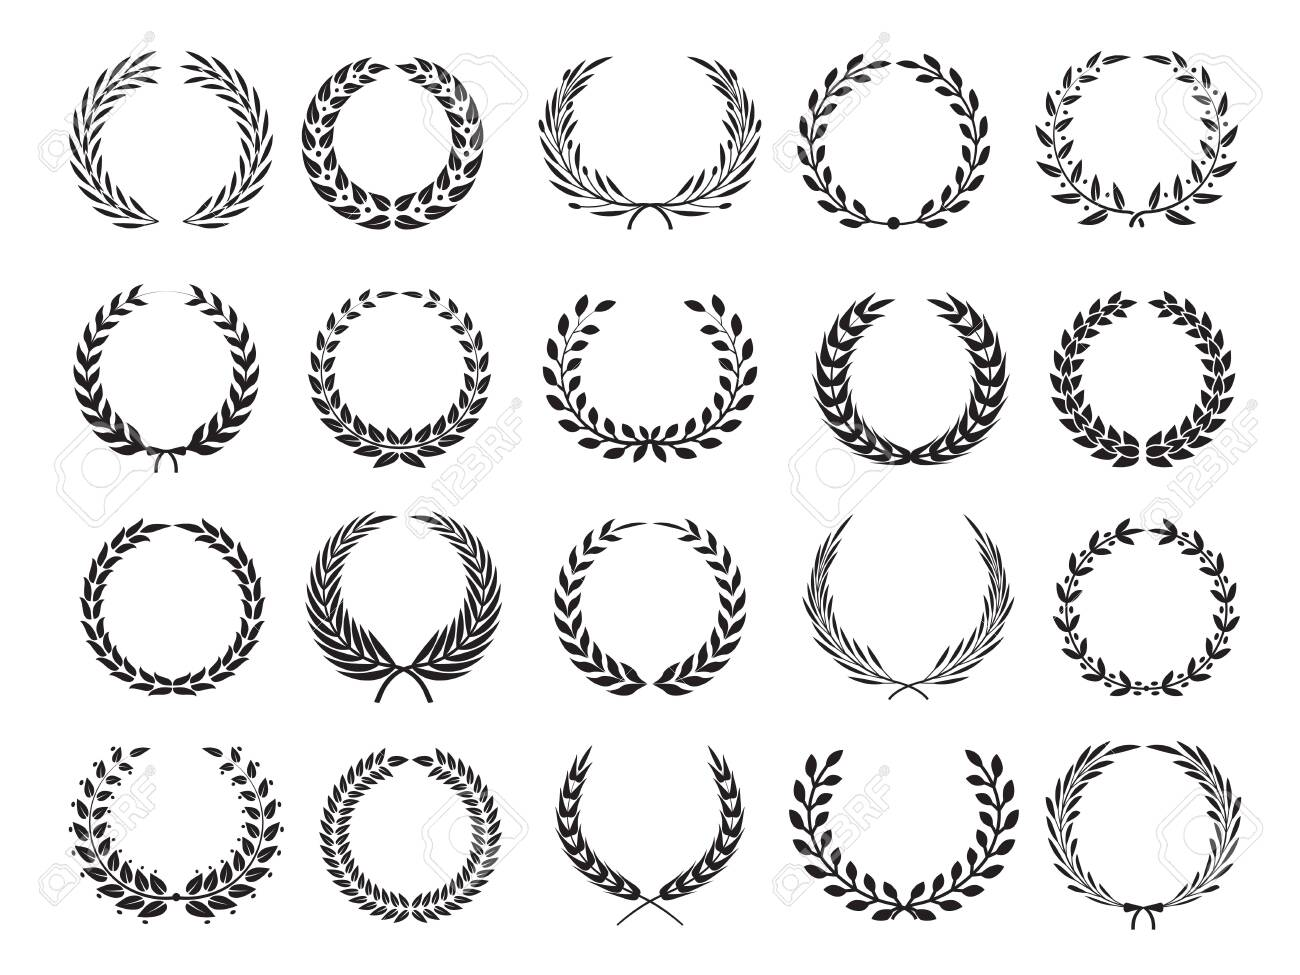 Greek branch. Circle victory award wreath with leaves vector elleents for emblems labels. Branch laurel wreath, emblem floral victory illustration - 126838379